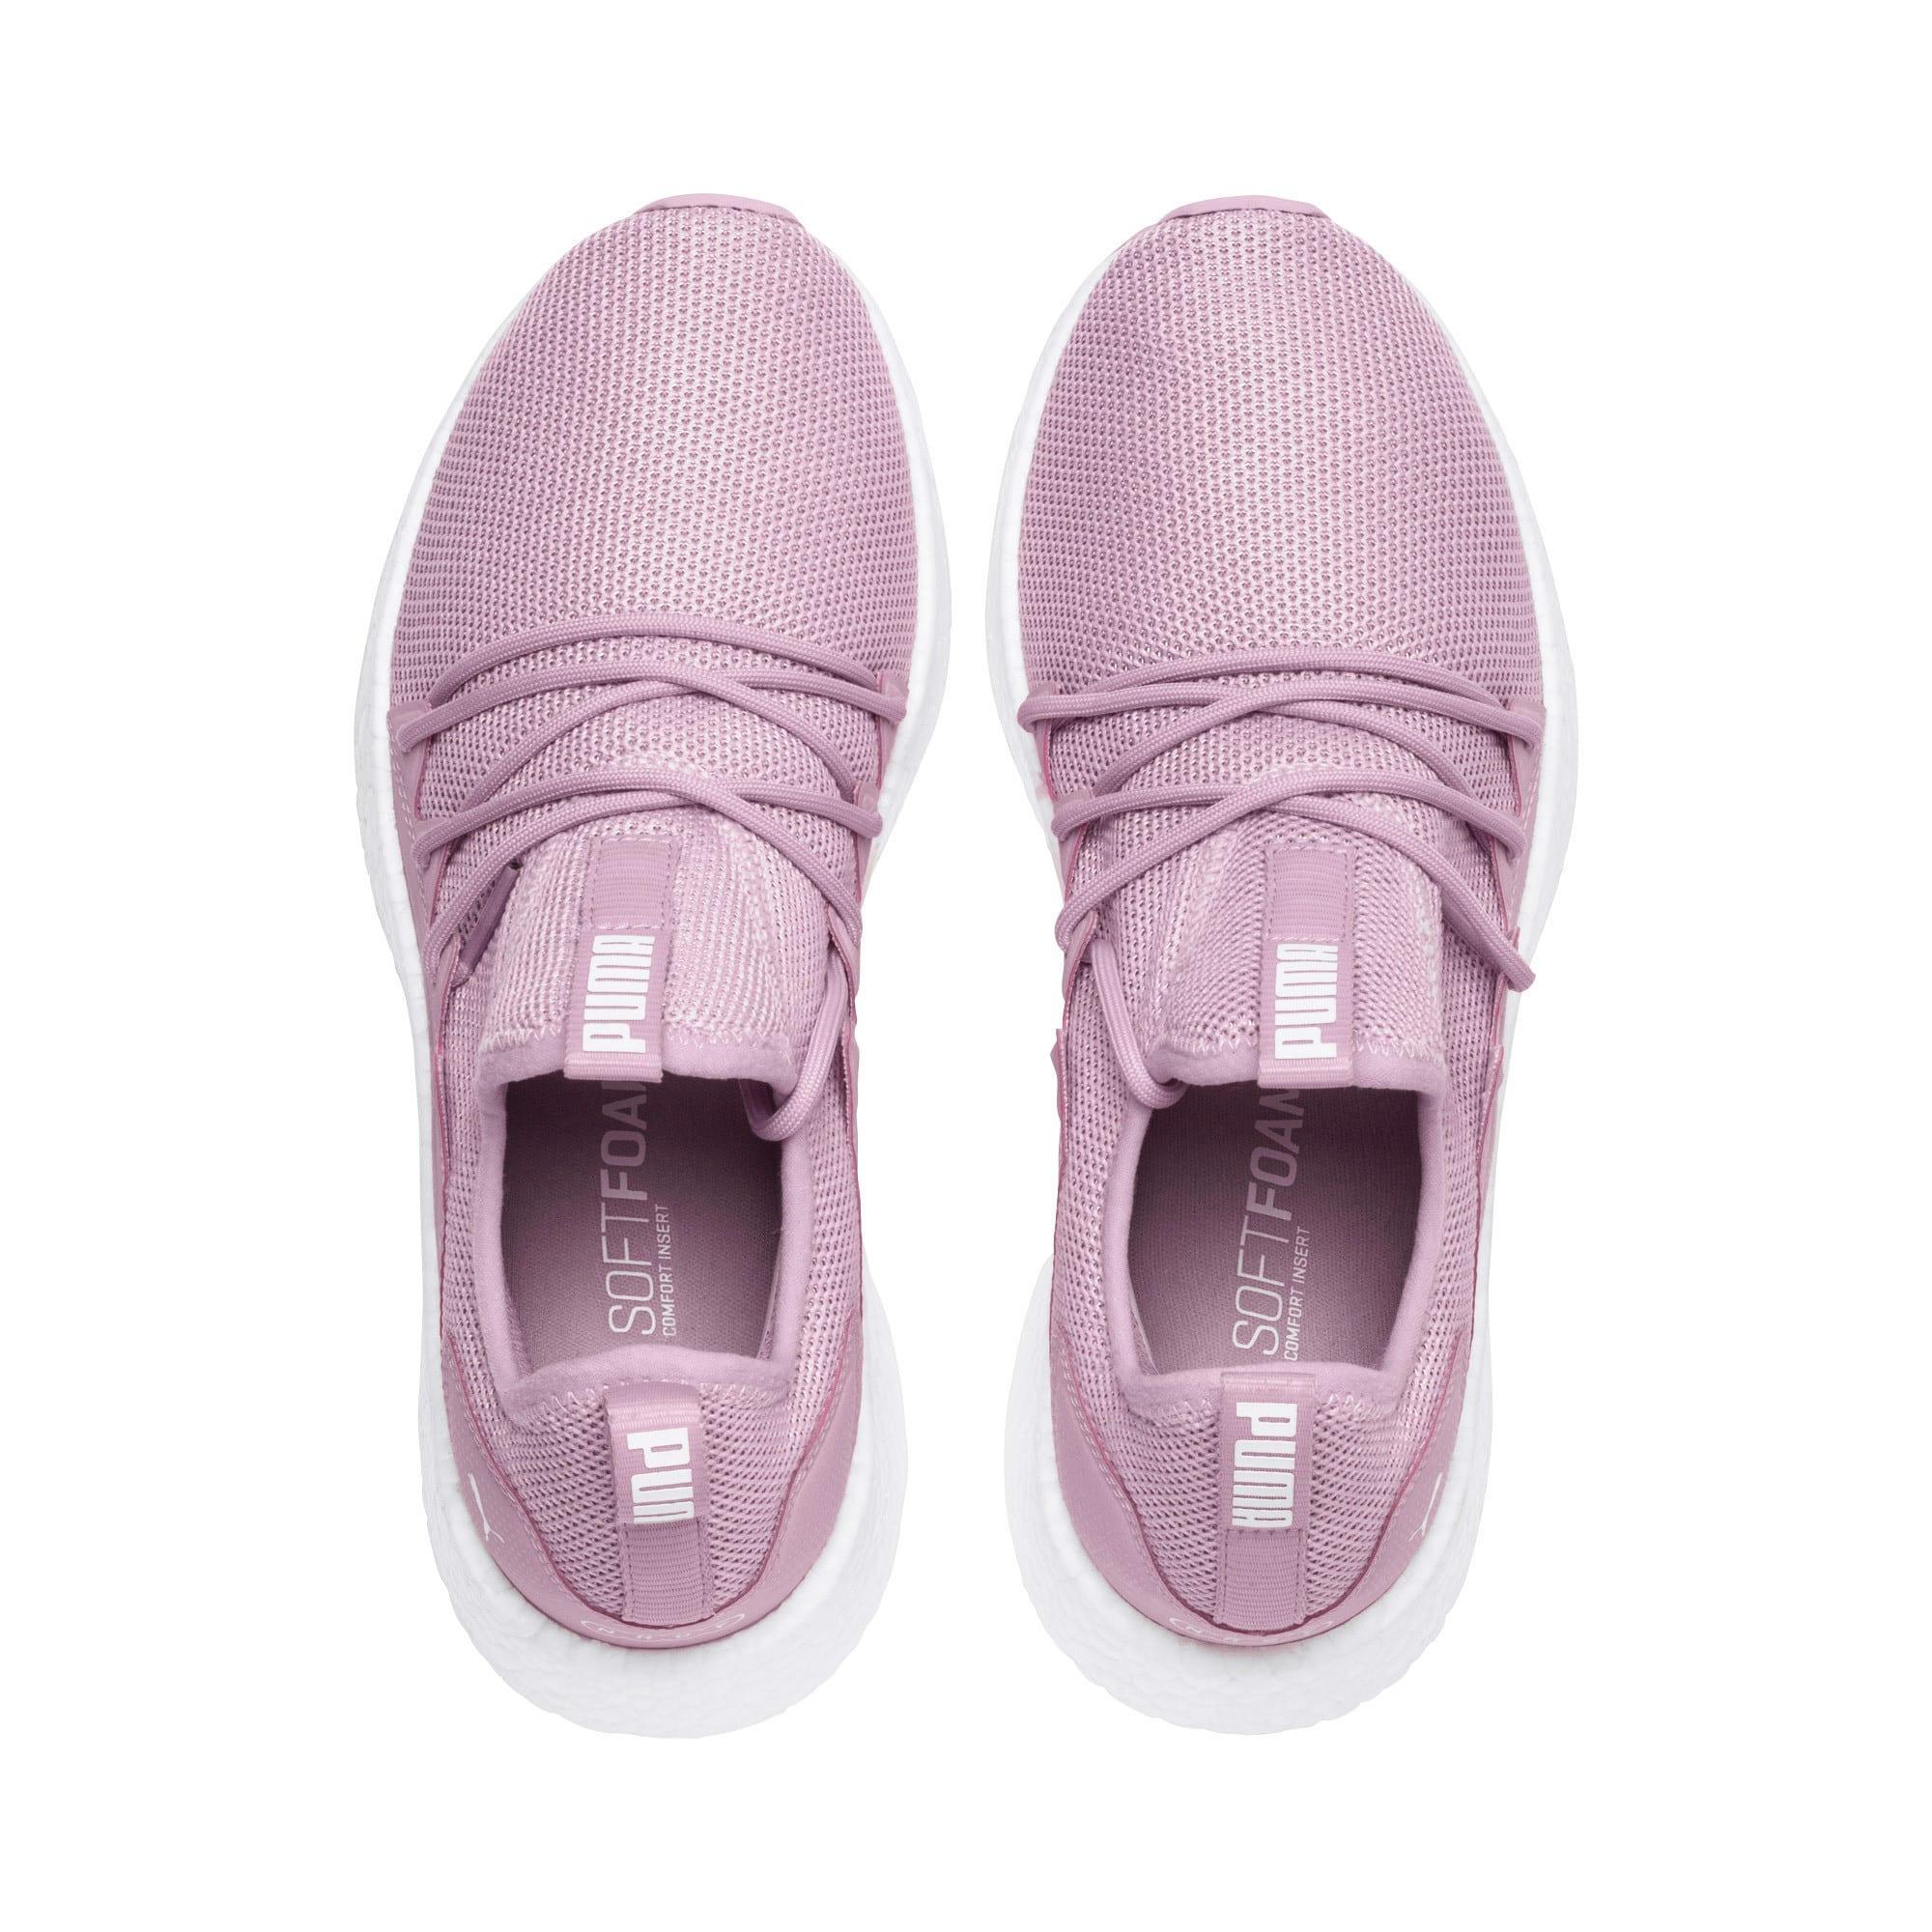 Thumbnail 6 of NRGY Neko Women's Running Shoes, Winsome Orchid-Puma White, medium